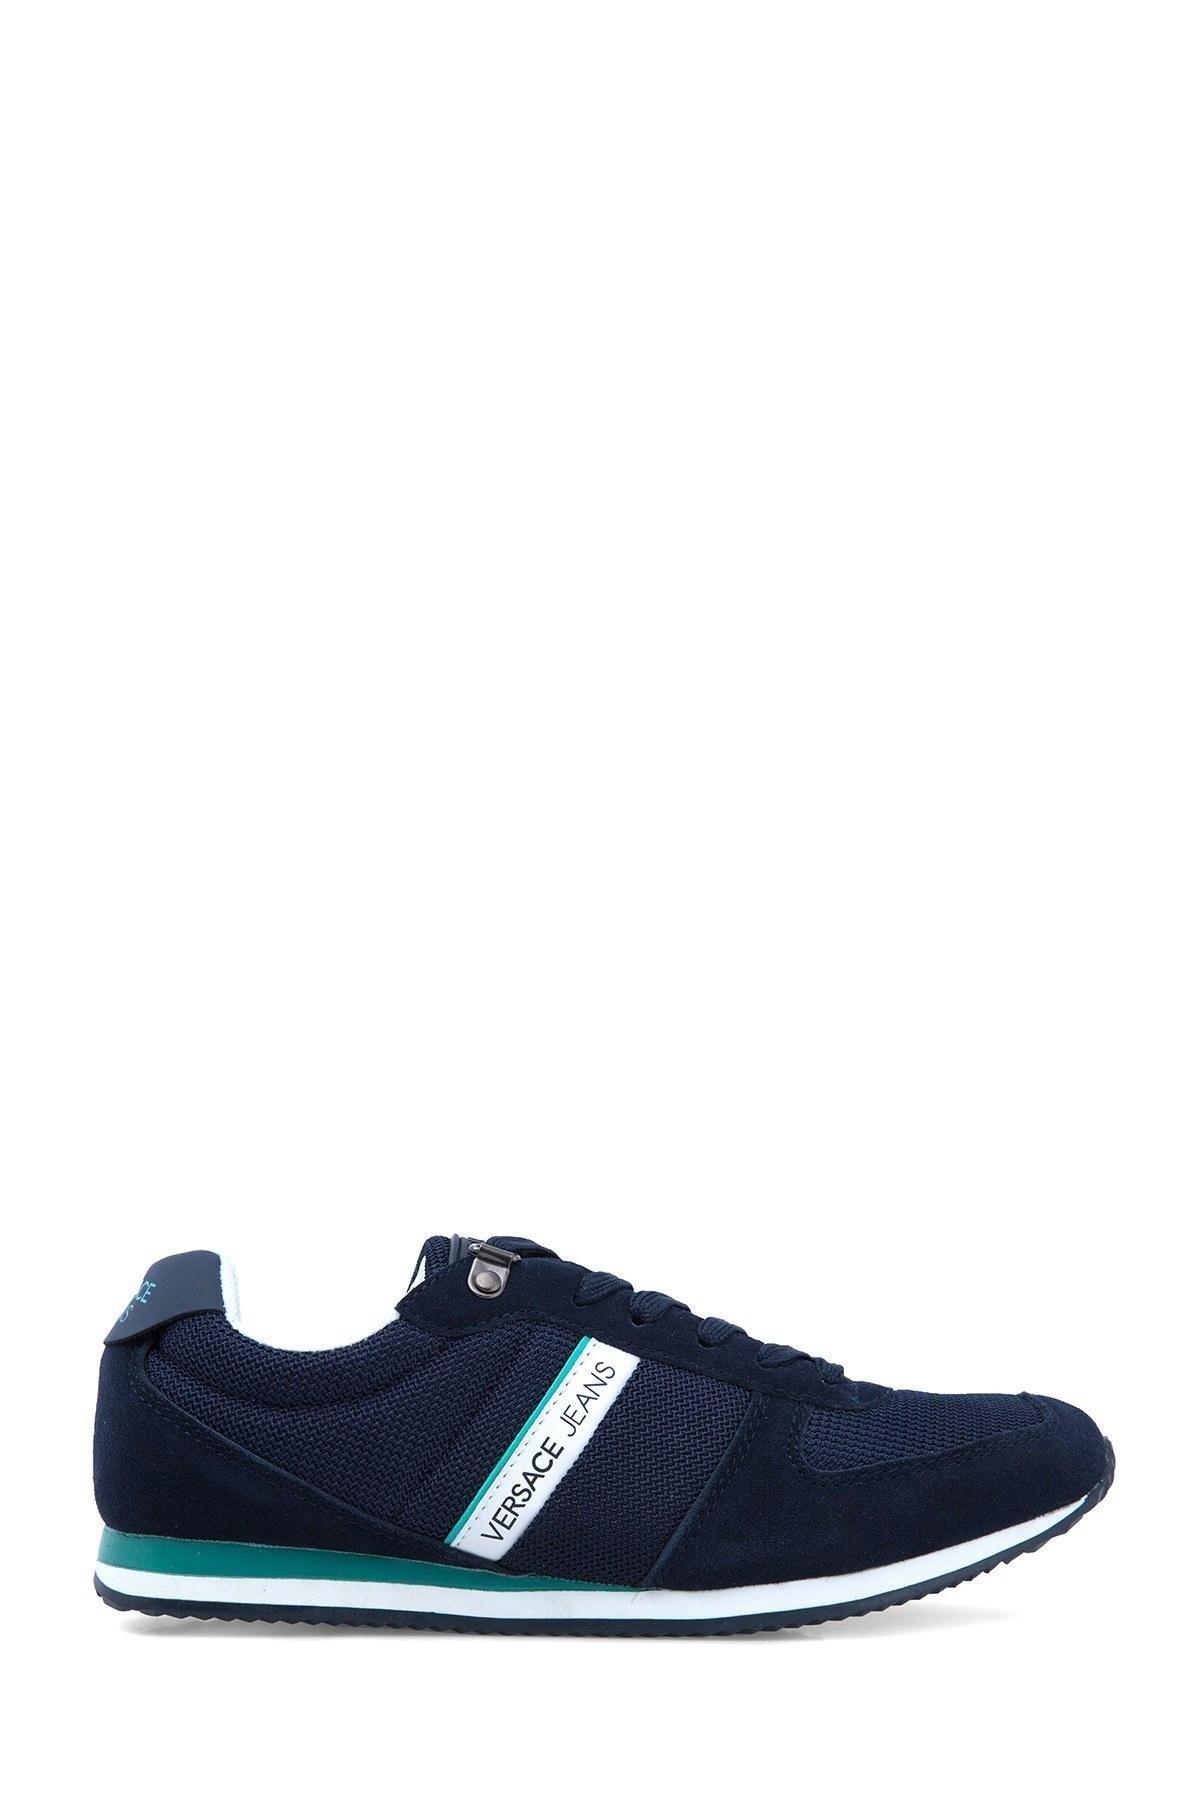 Versace Jeans Erkek Ayakkabı E0YTBSA1 70913 239 LACİVERT